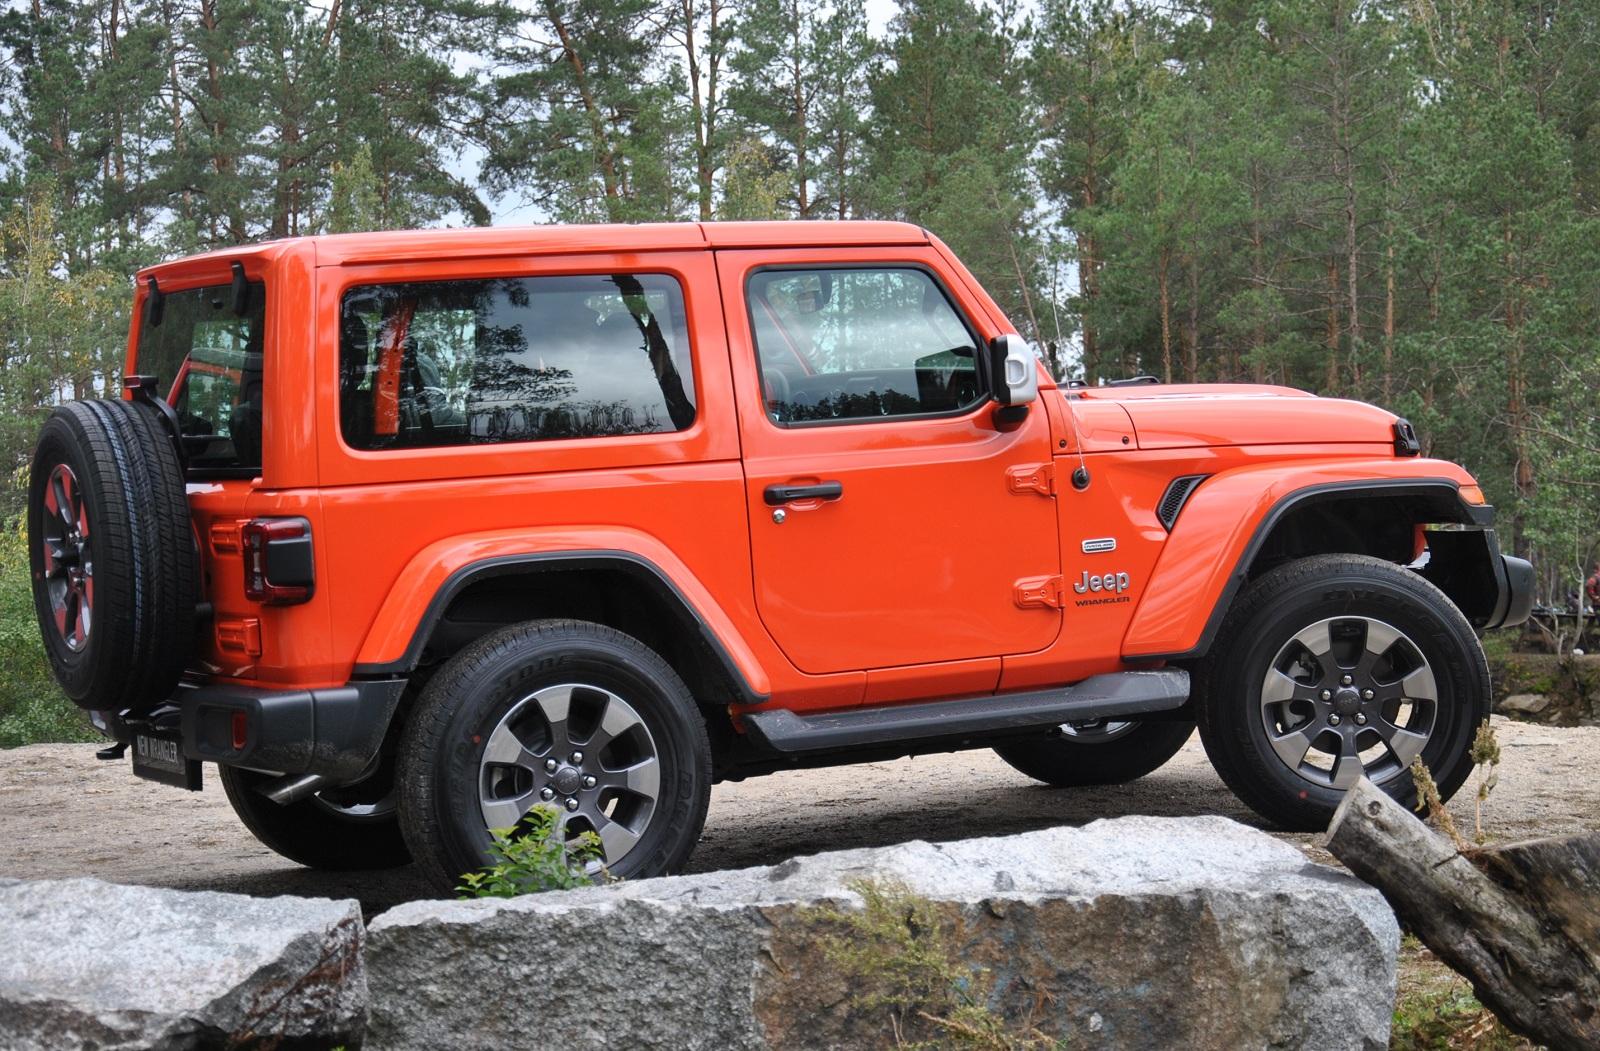 Тест-драйв нового Jeep Wrangler в Украине: король бездорожья